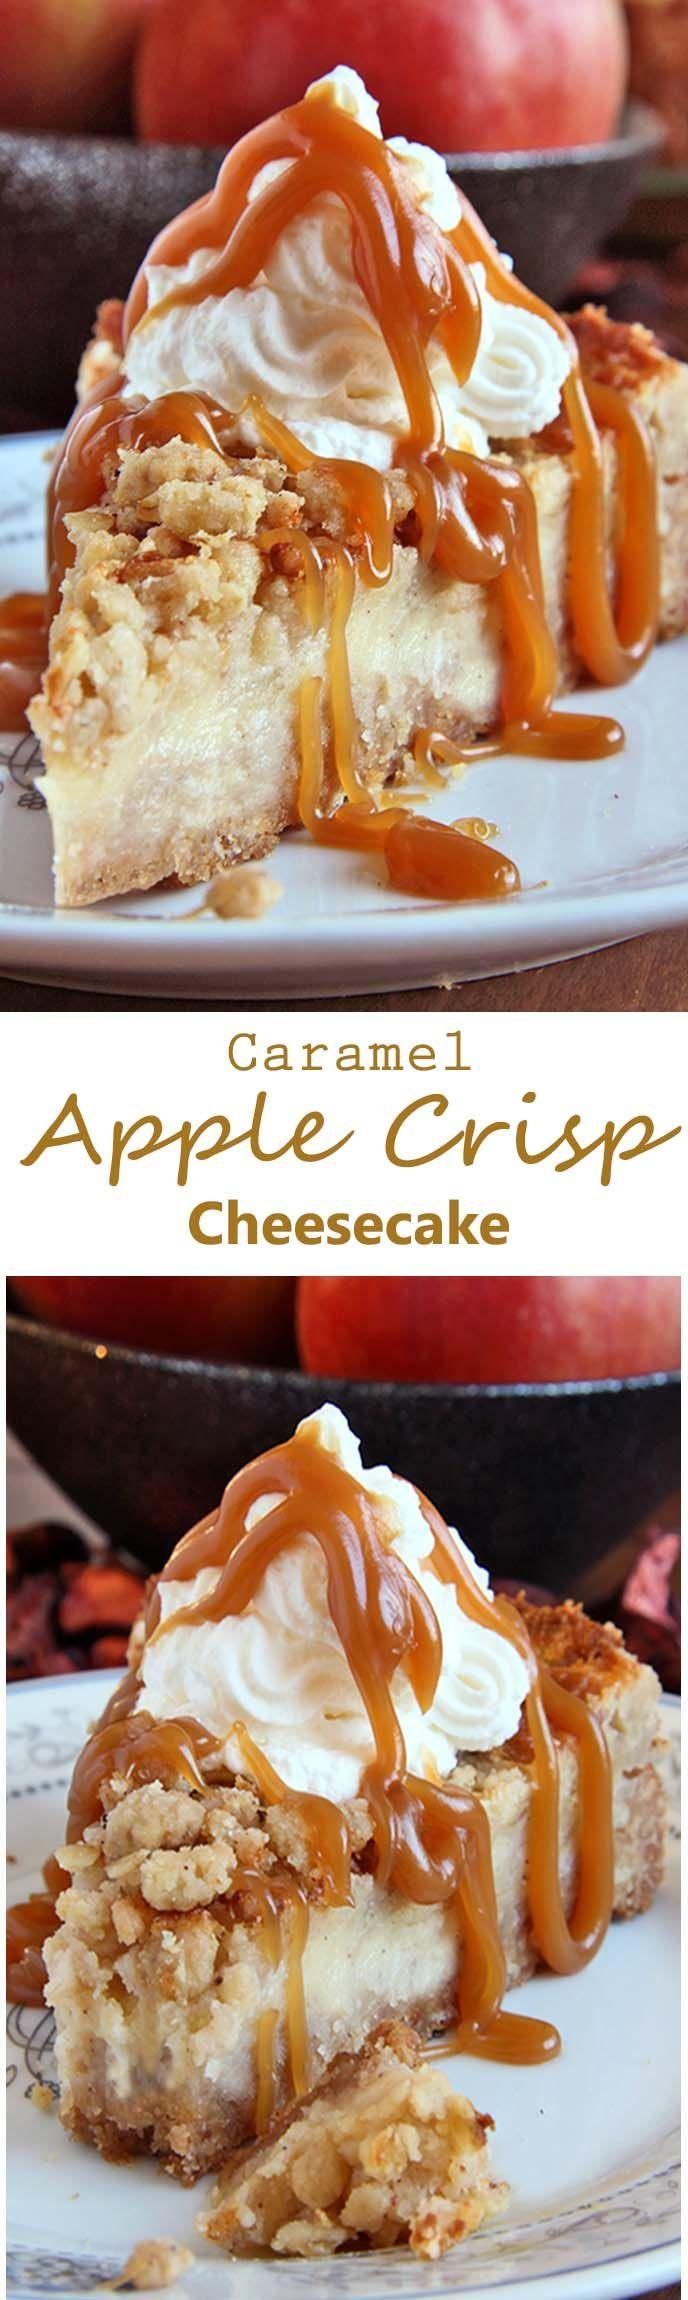 Caramel Apple Crisp Cheesecake | Nosh-up